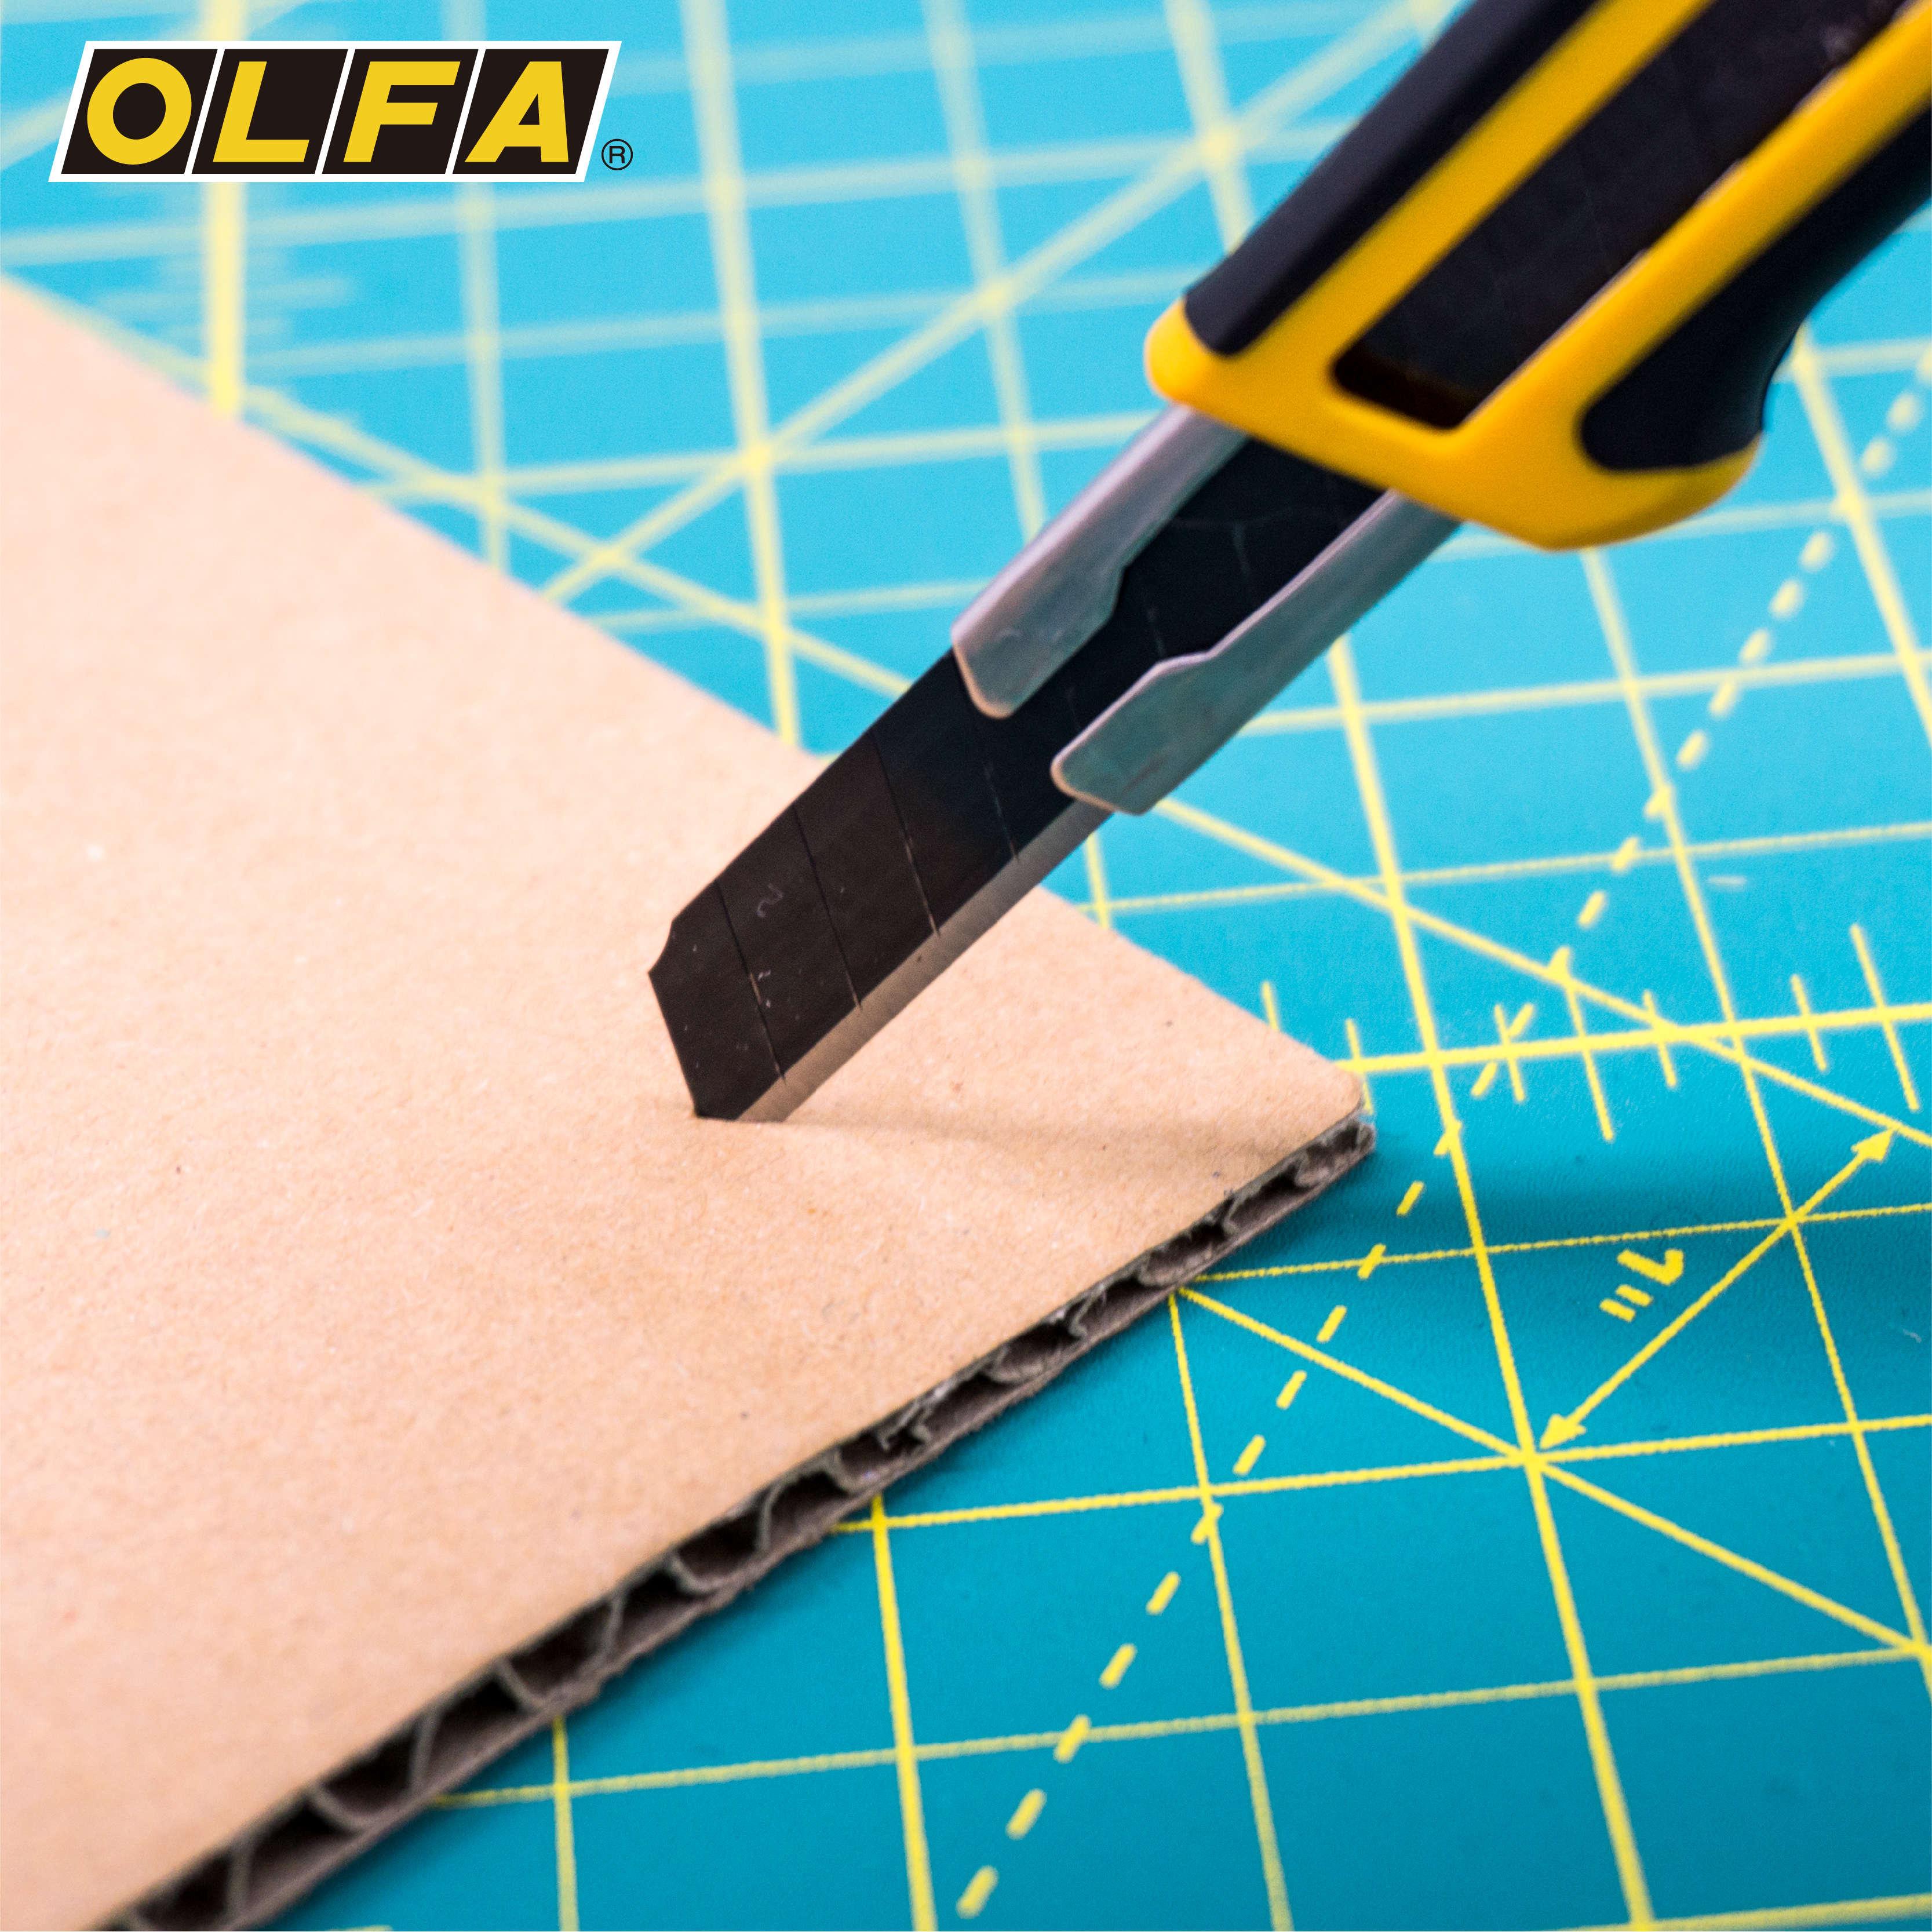 OLFA original imported tool small cutting knife 9mm comfortable tool holder X series OLFA XA 1|Fabric Decorating| |  - title=